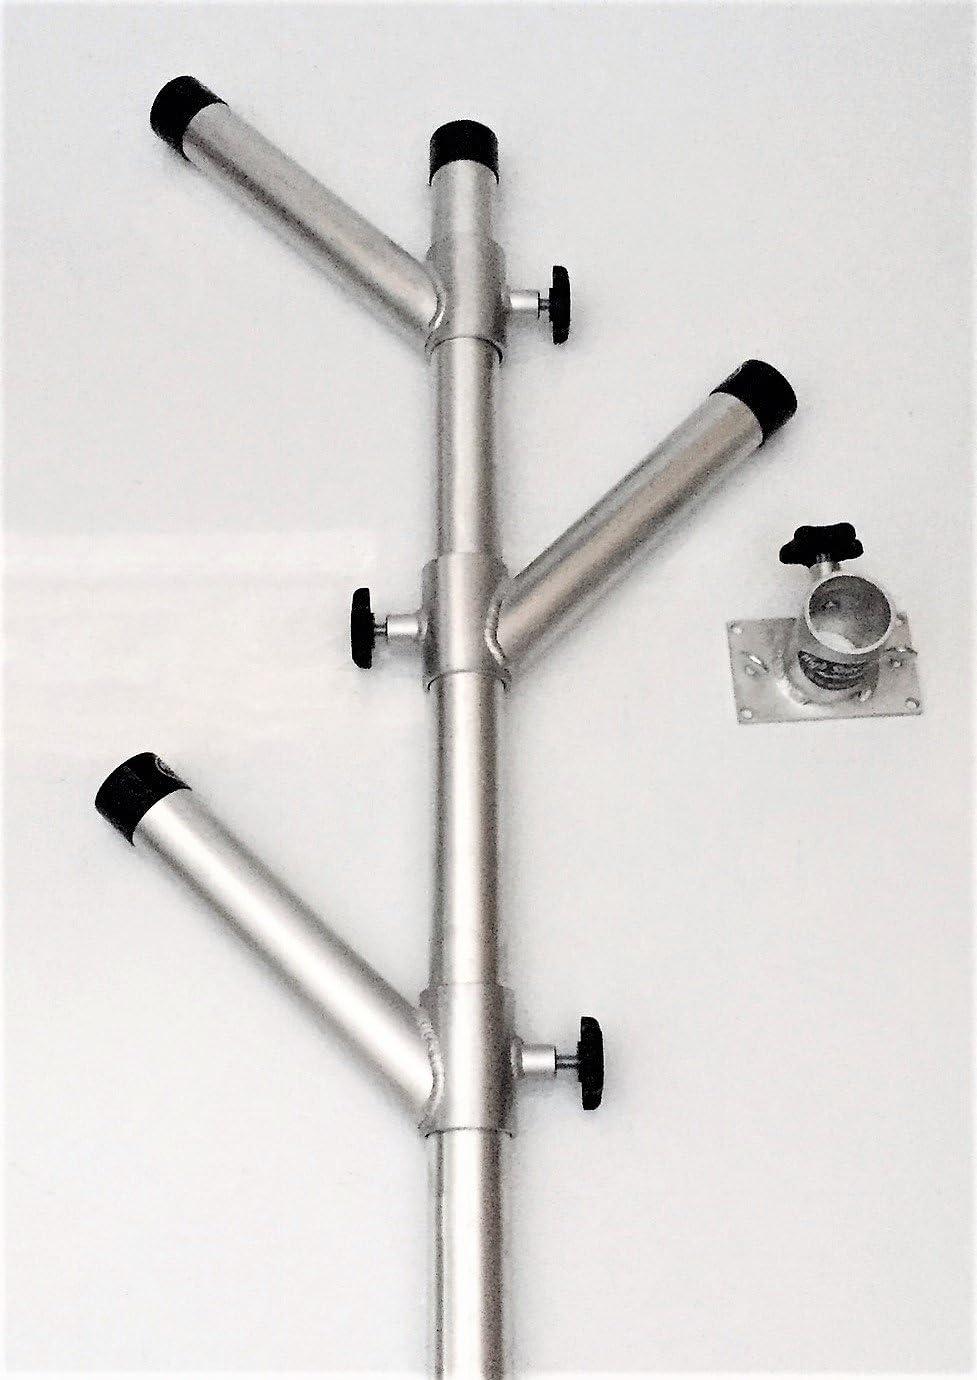 Rod Holder Adjustable Tree Triple Unit with Base Stainless Steel Fishing Holders